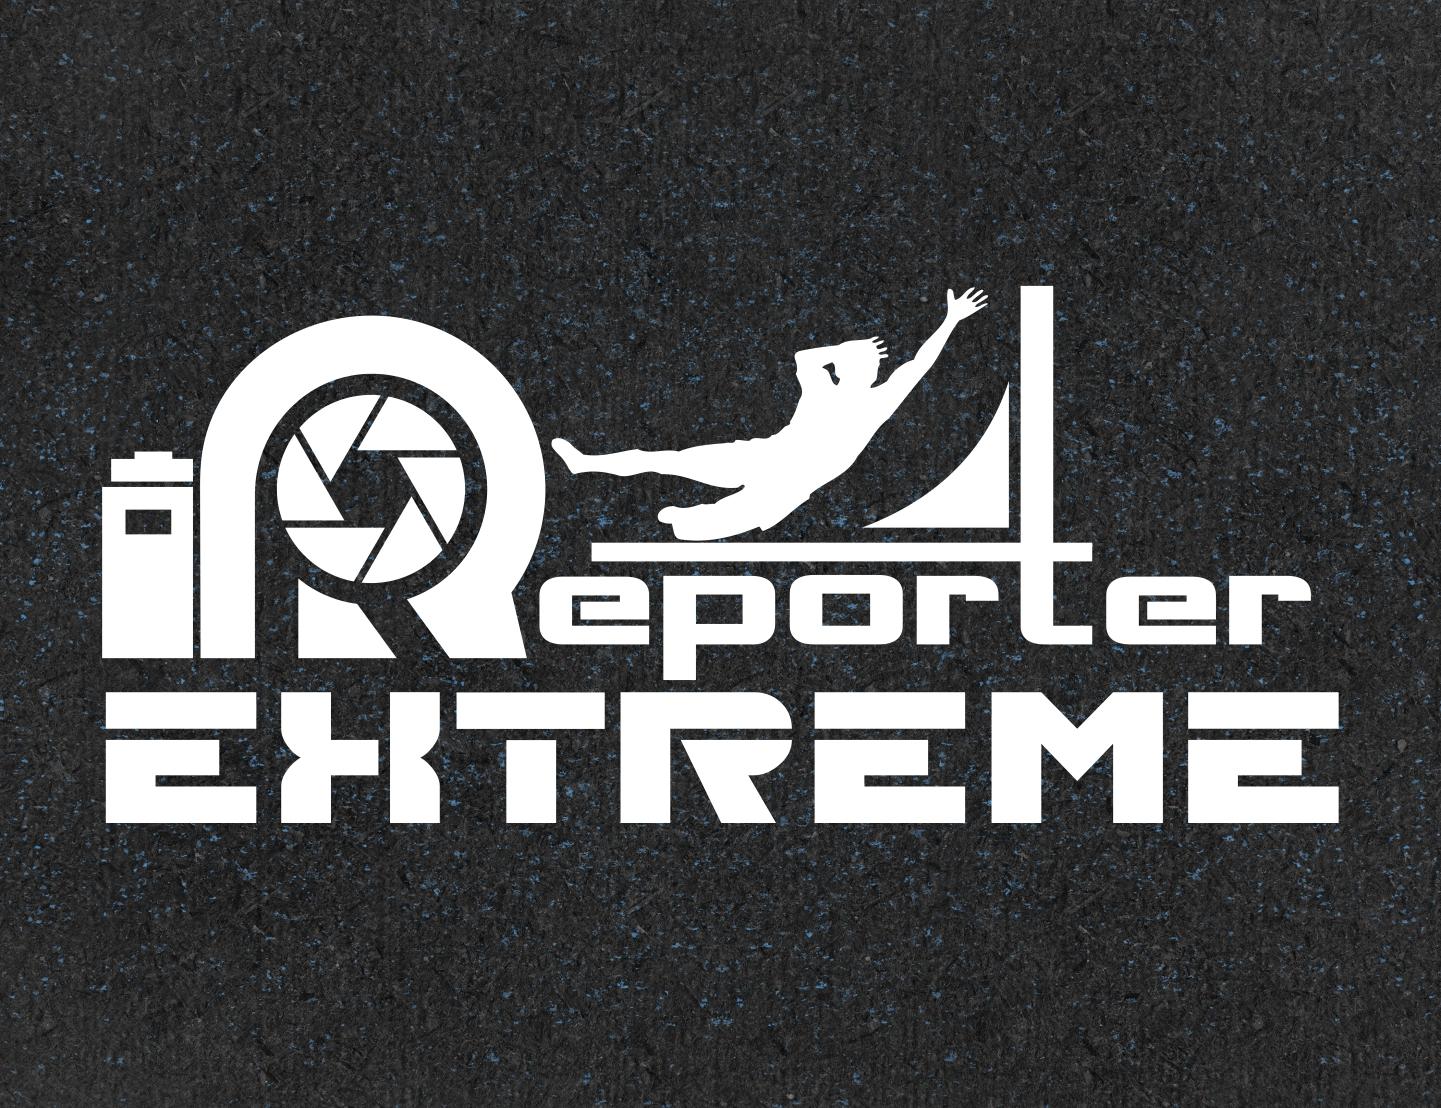 Логотип для экстрим фотографа.  фото f_5885a51f8ee2bee9.jpg